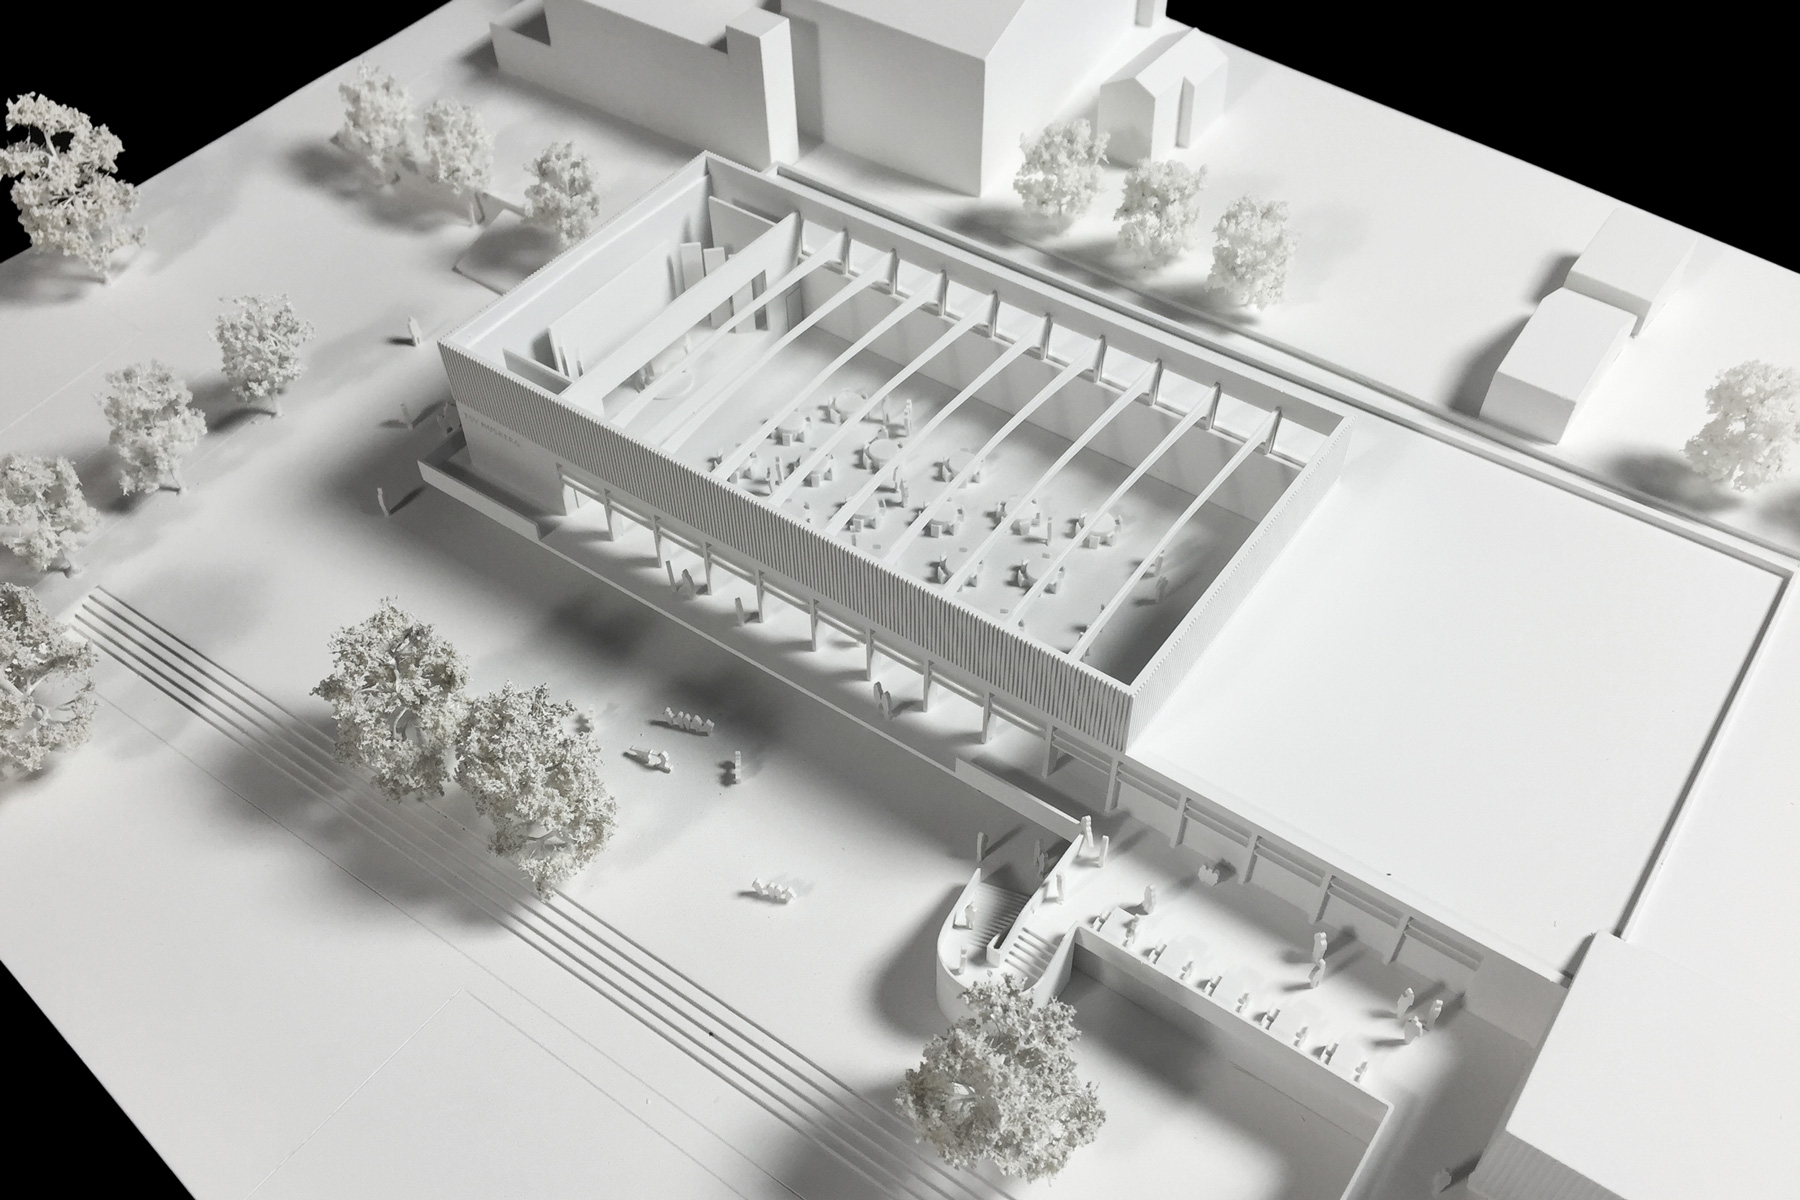 architekturmodell festhalle musberg b la berec modellbau. Black Bedroom Furniture Sets. Home Design Ideas